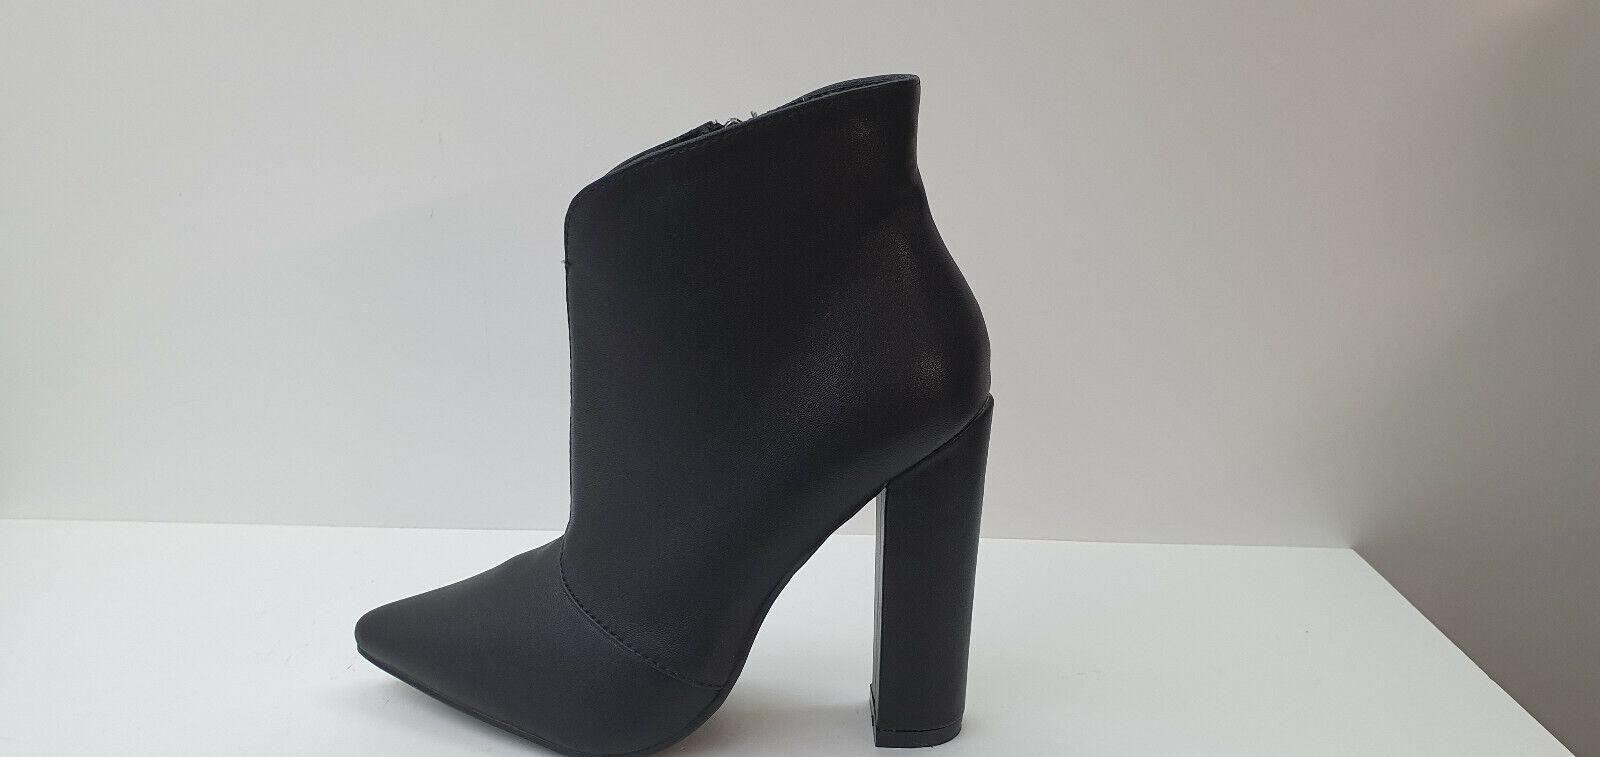 Knöchelschuhe Frau Fersini - Rabatt -50 % art. RD - 2128 - P - schwarz Farbe